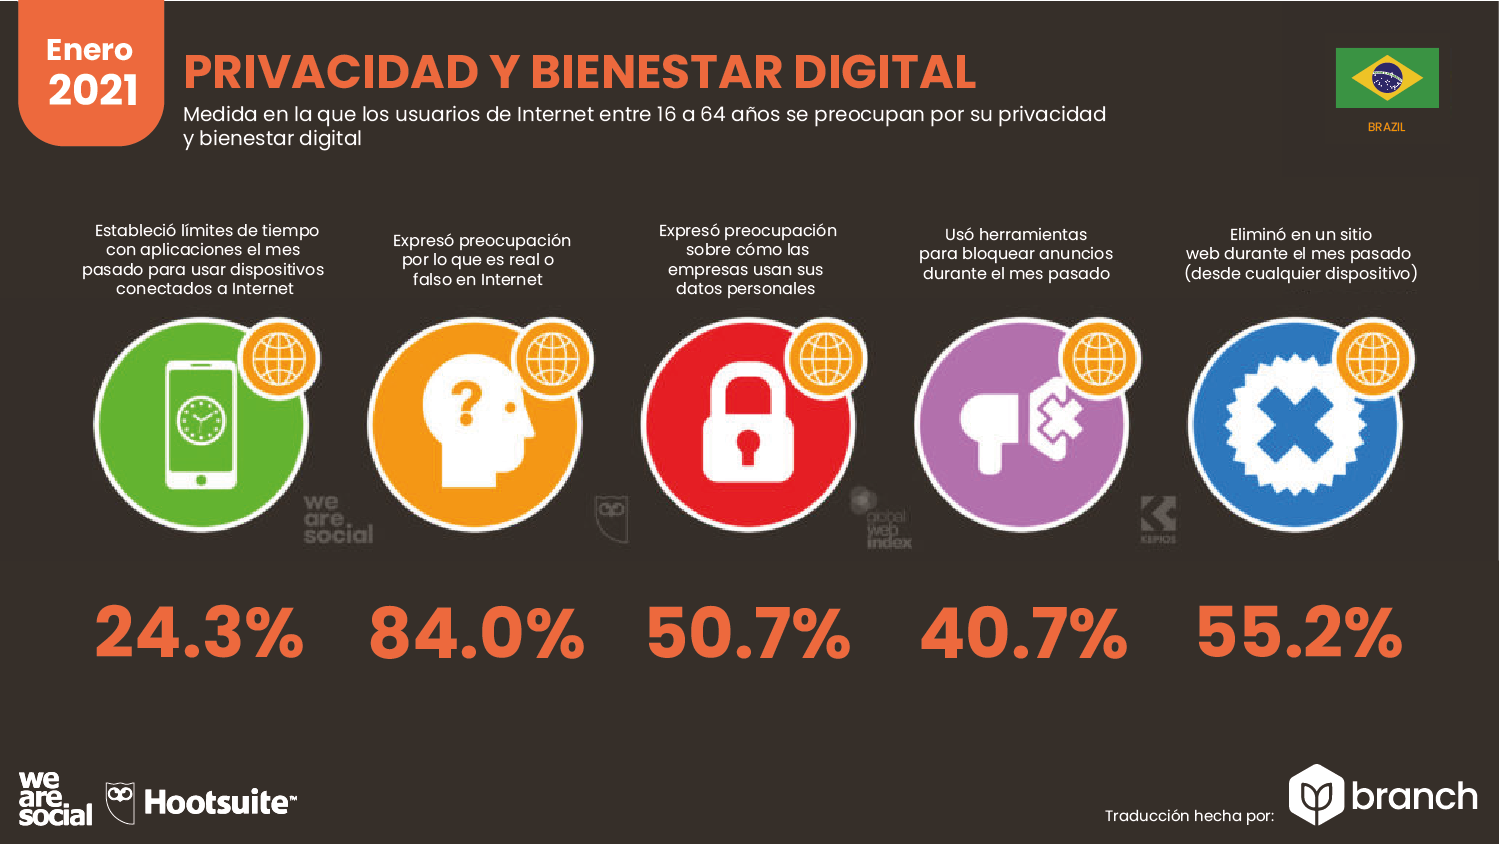 privacidad-y-bienestar-digital-brasil-2020-2021